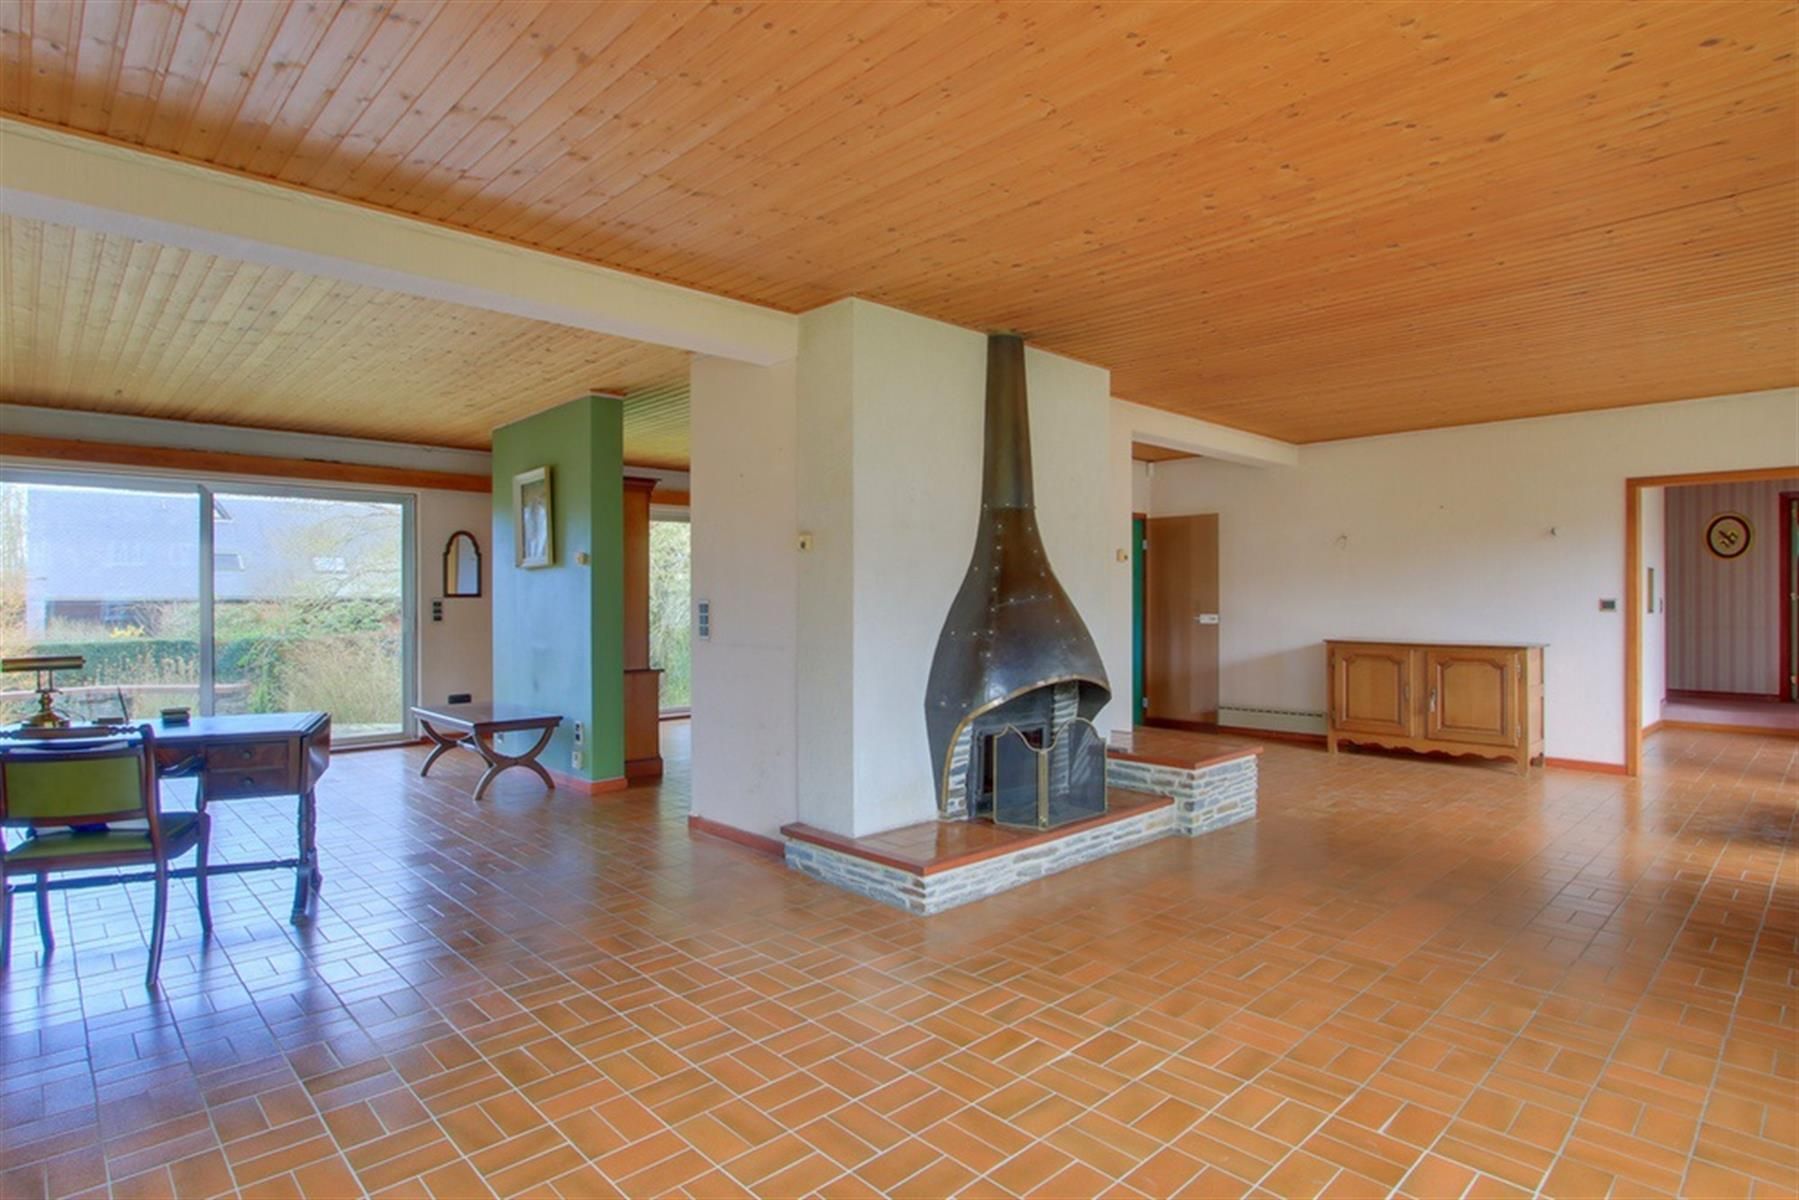 Villa 3 chambres de plain pied